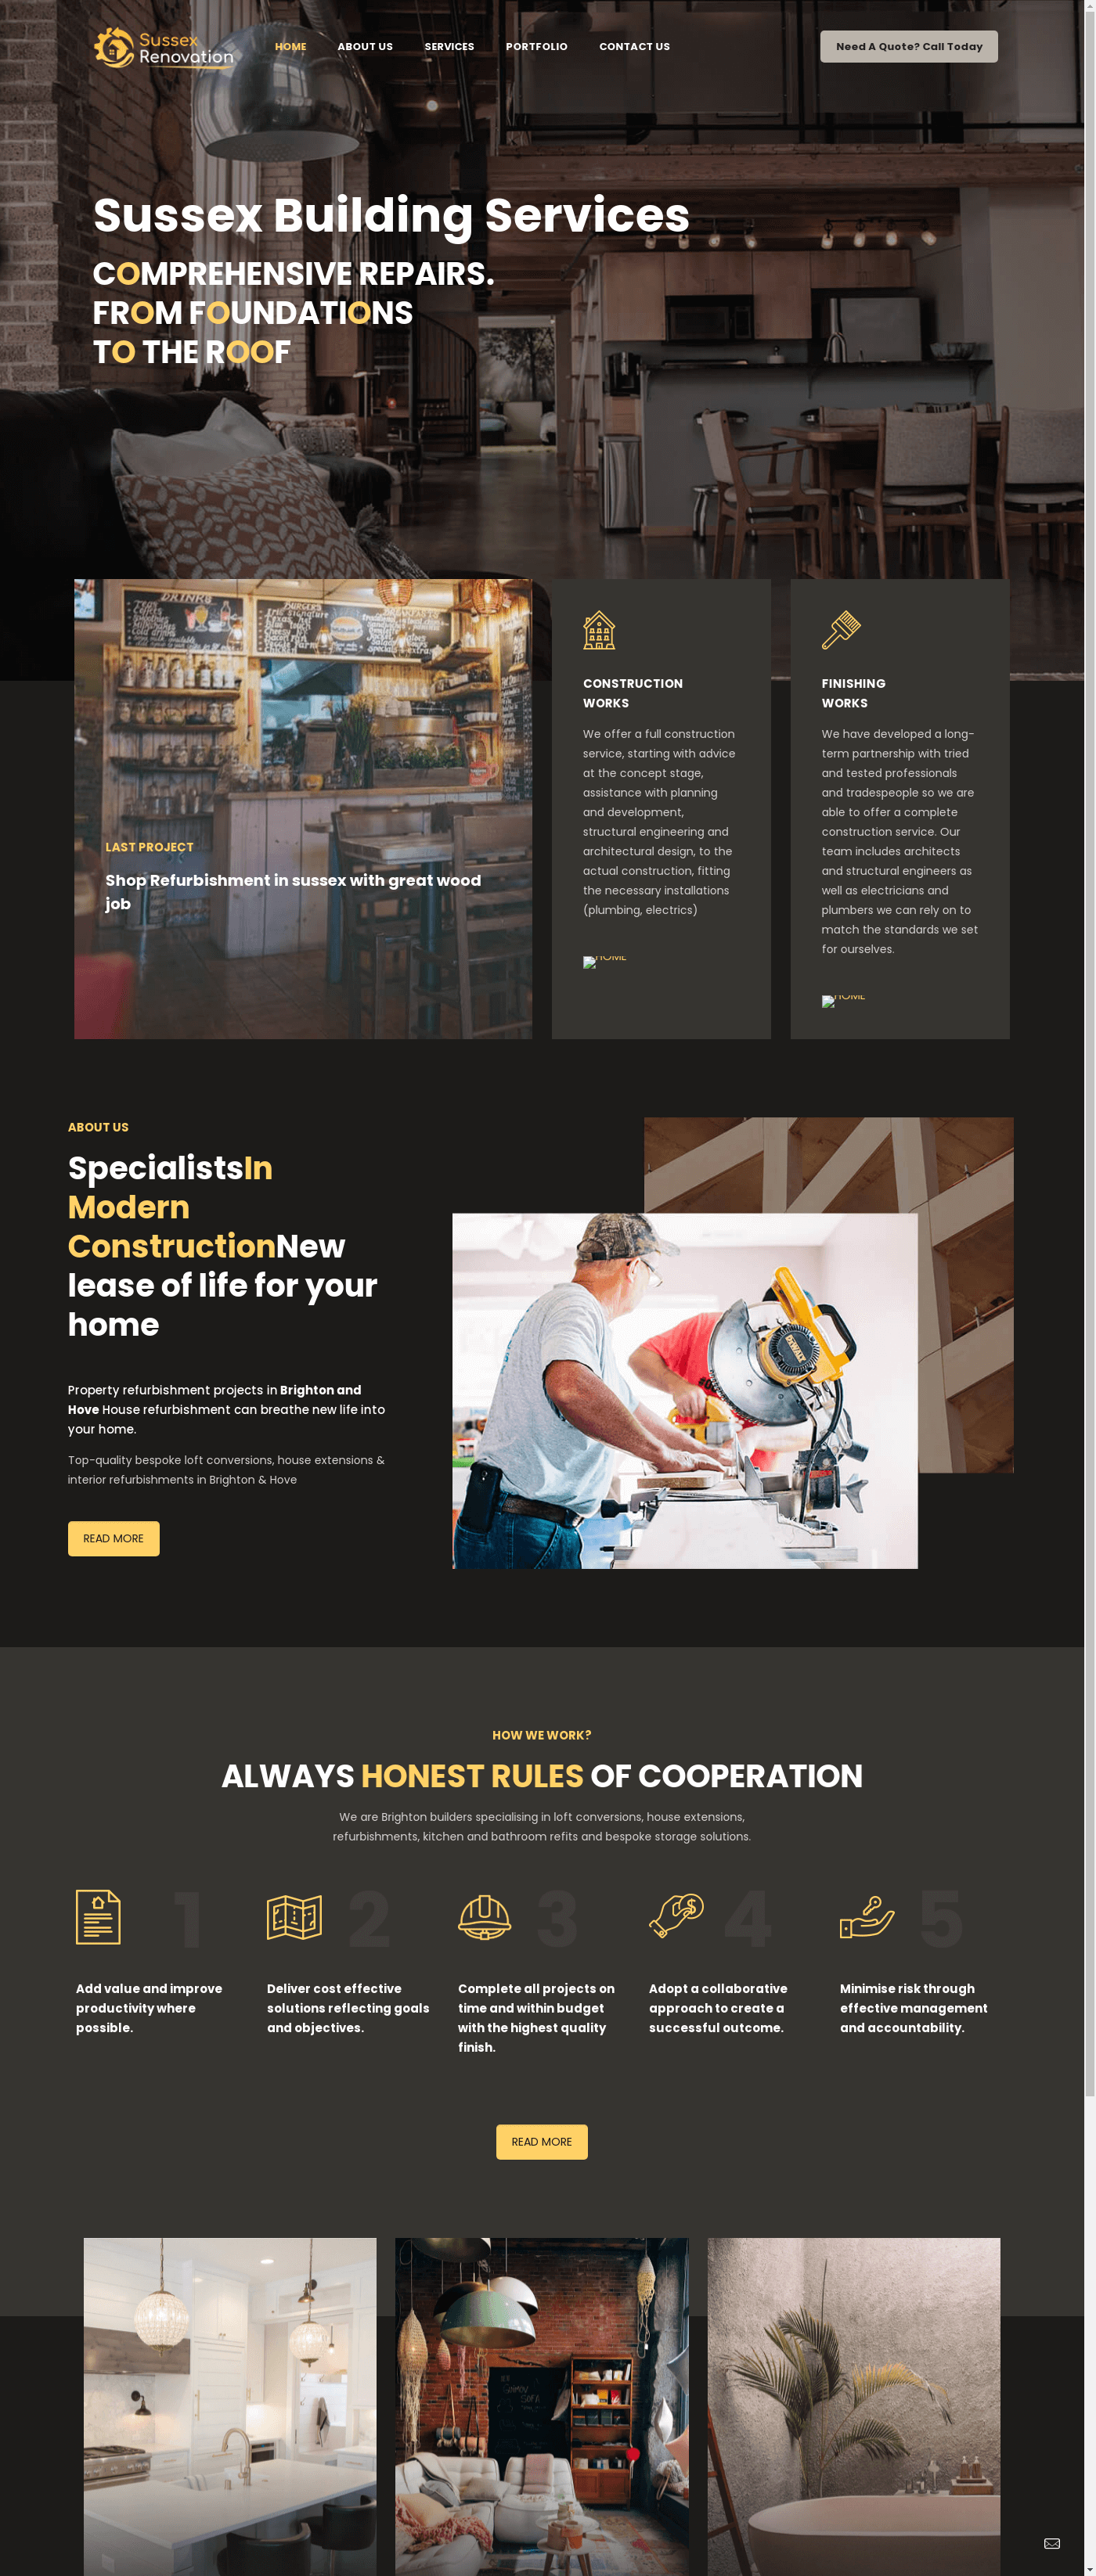 sussex renovation- ad1 agency website desing renovation